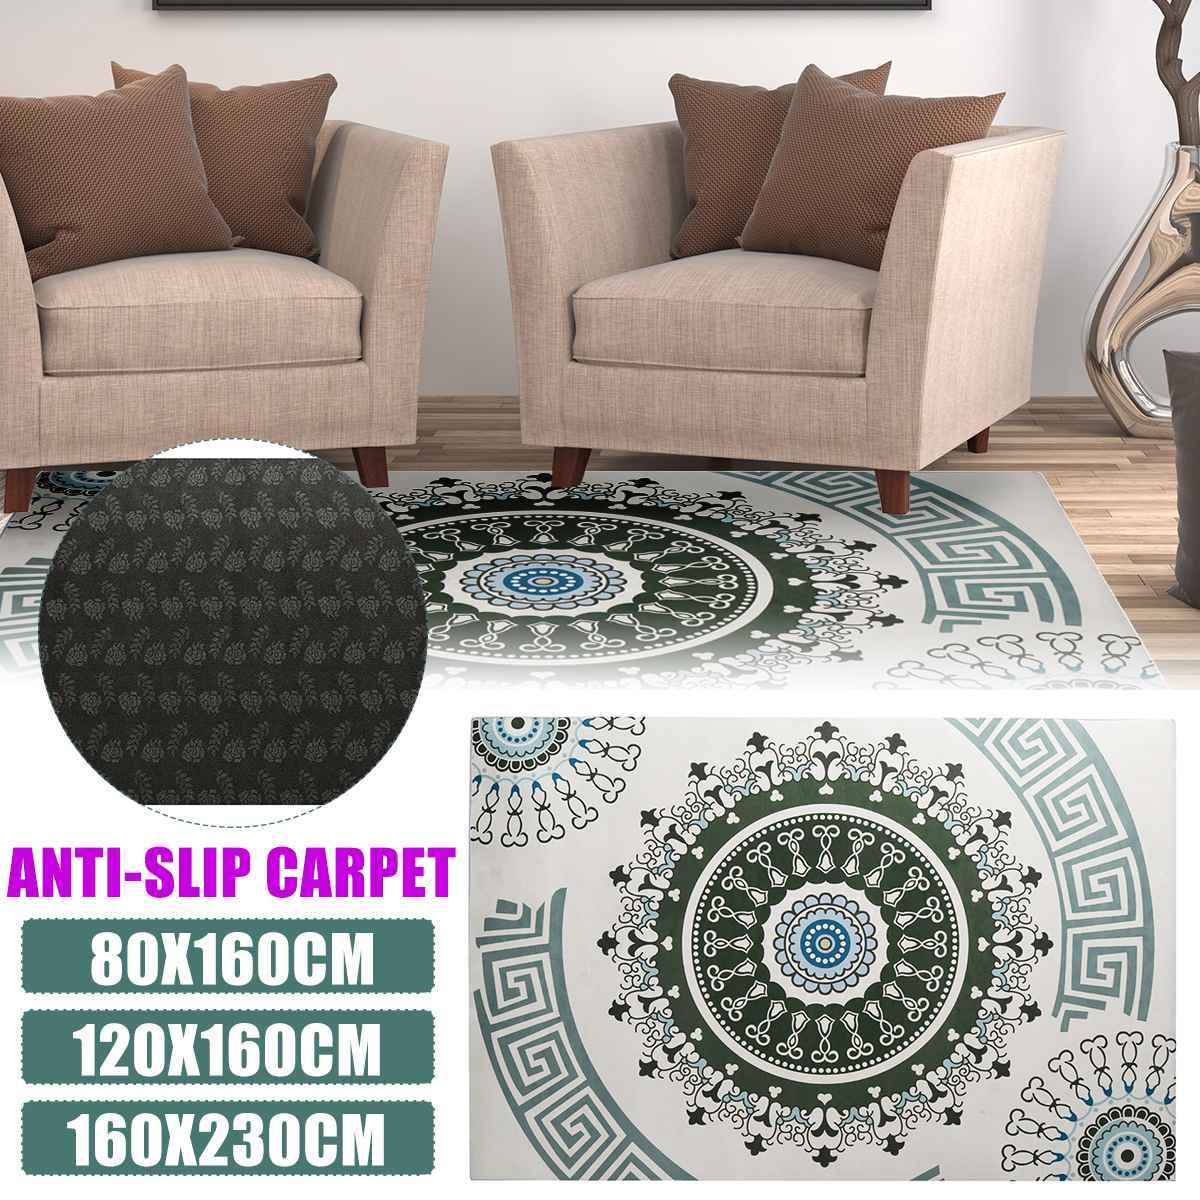 Bohemia Ethnic Mandala Round Floor Carpet Soft Classic Geometric Flower Sofa Rug Europe Retro Large Area Rug For Living Room Carpet  - AliExpress